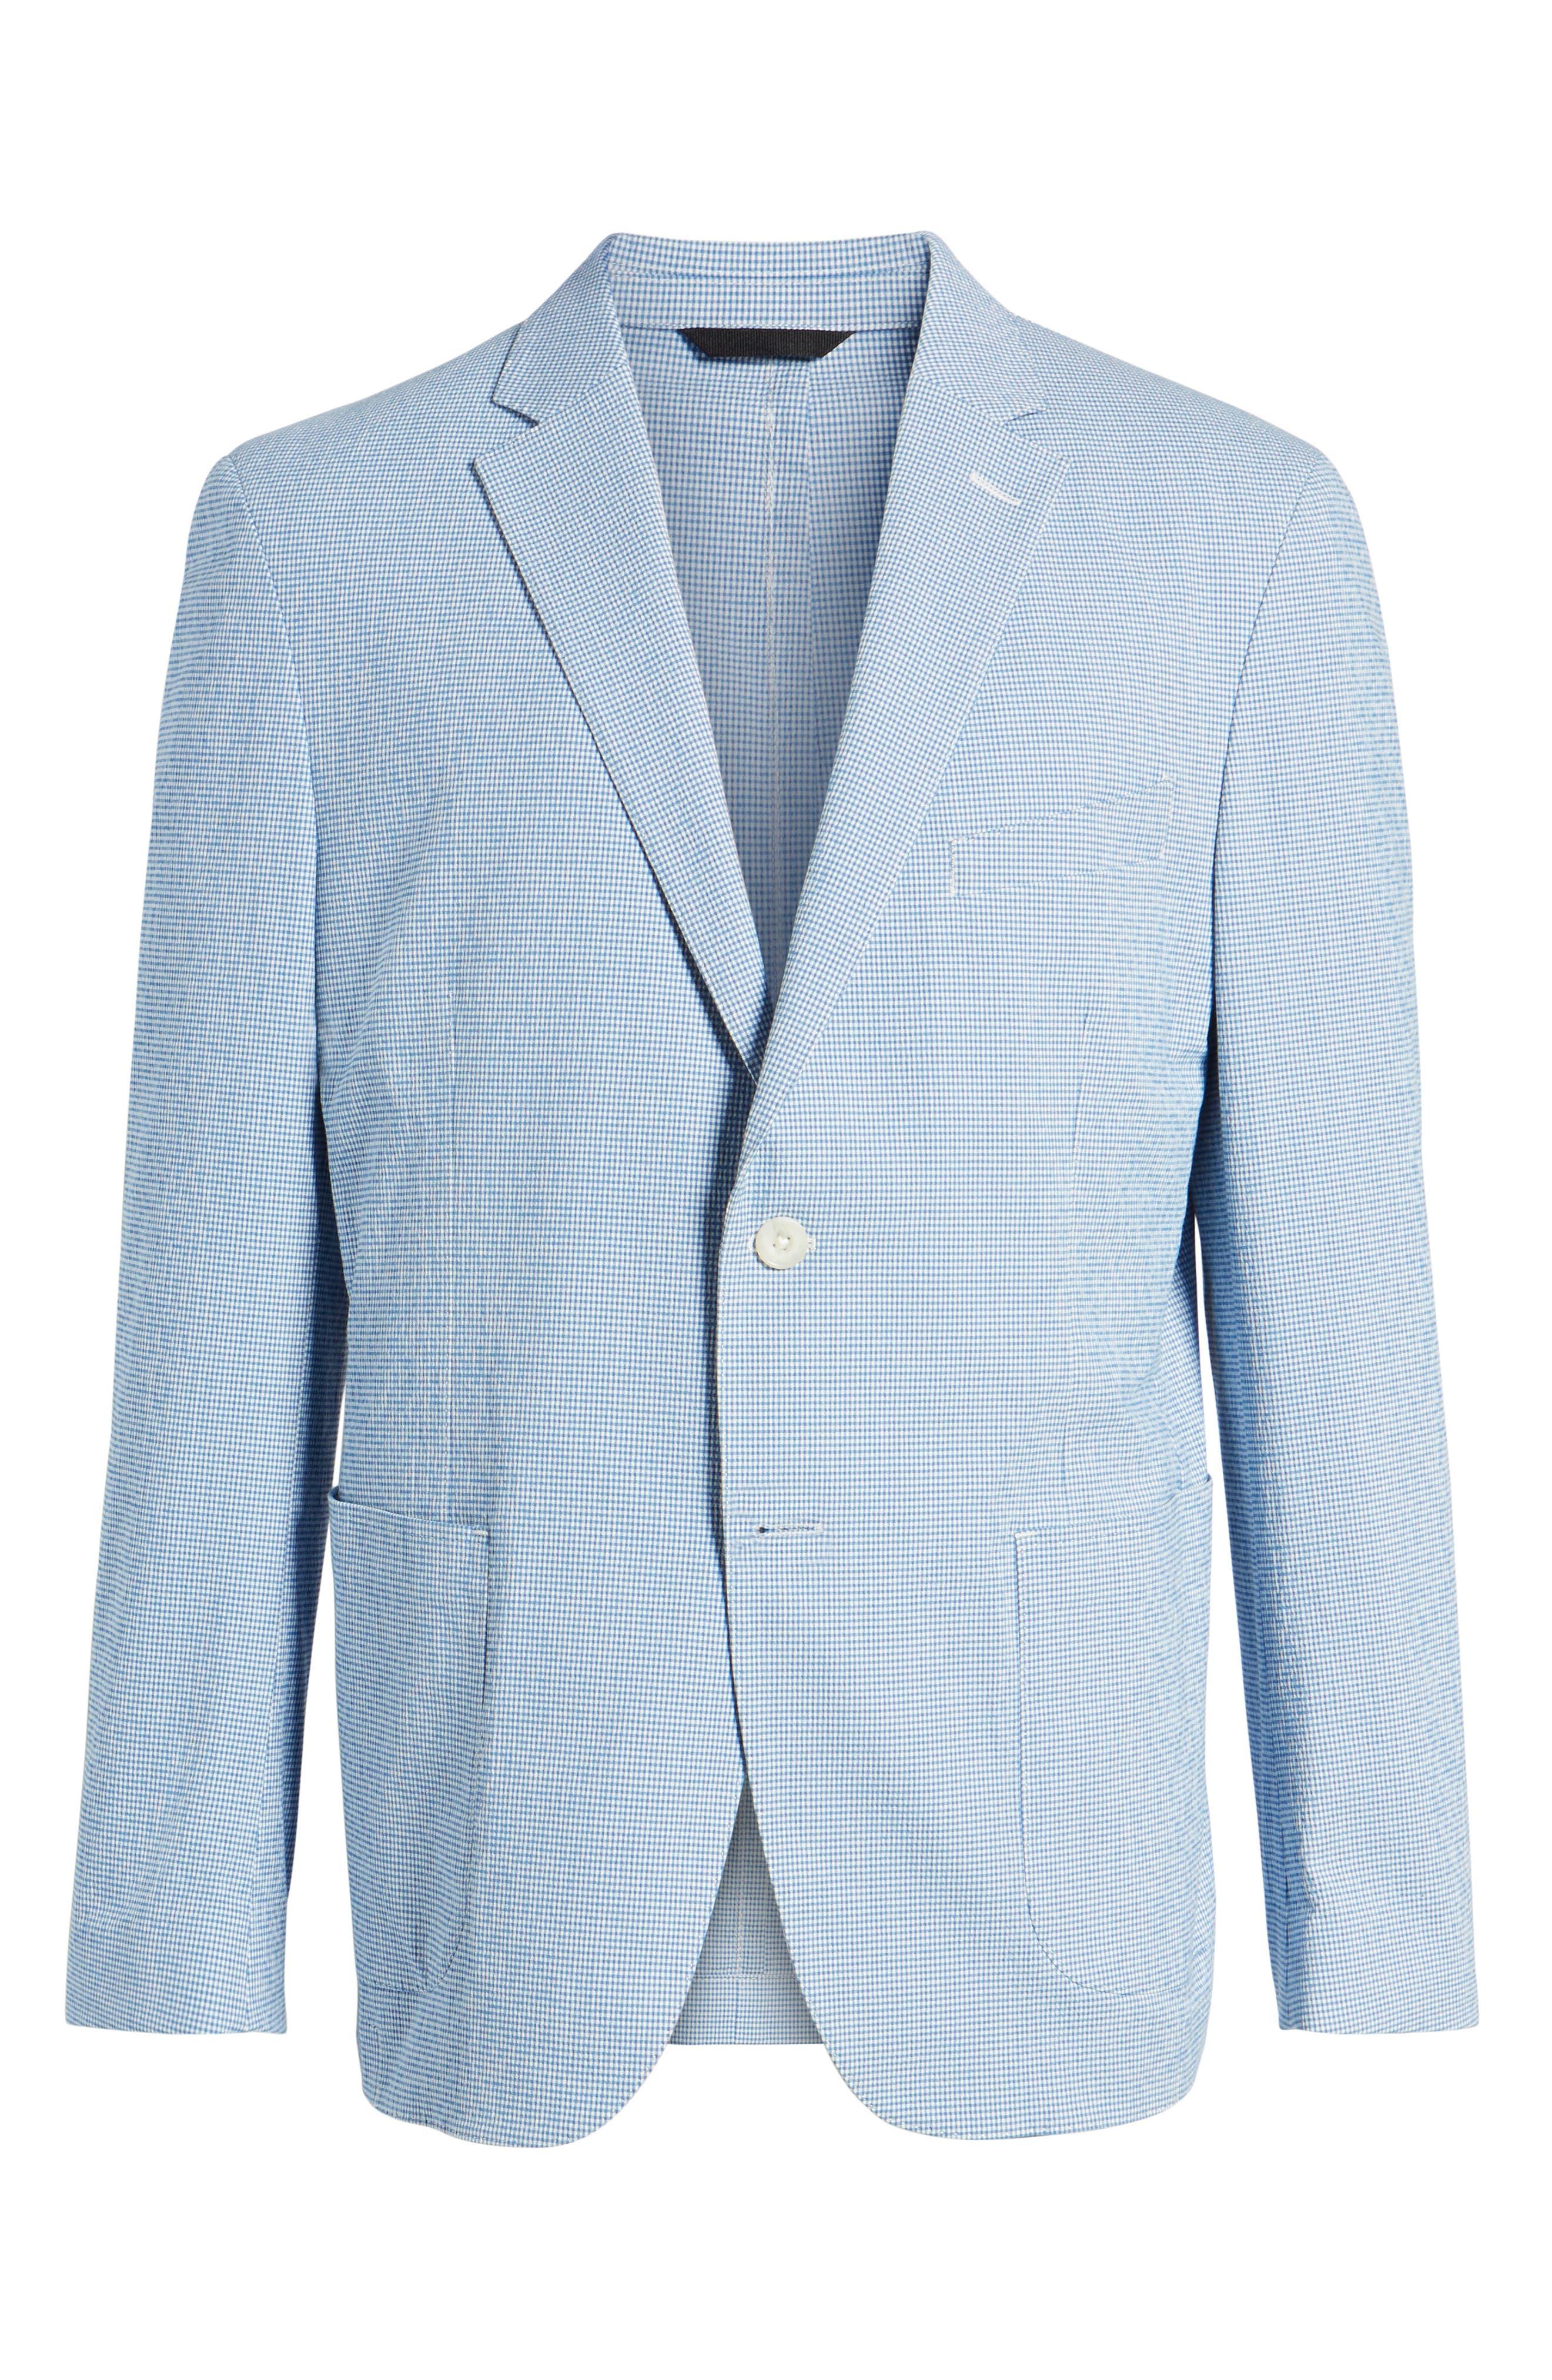 Slim Fit Microcheck Soft Sport Coat,                             Alternate thumbnail 6, color,                             Blue